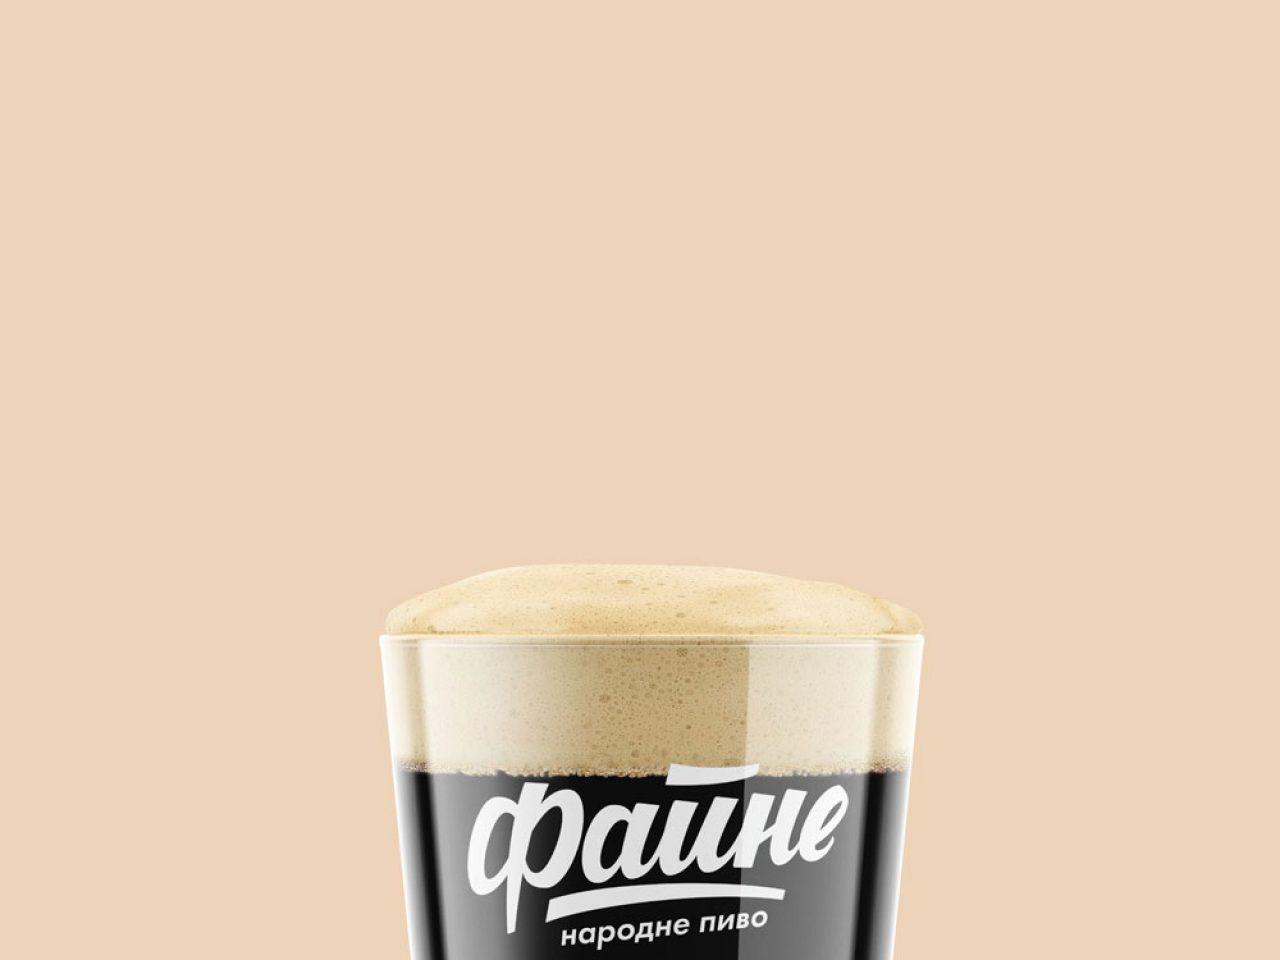 Fayne Craft Beer